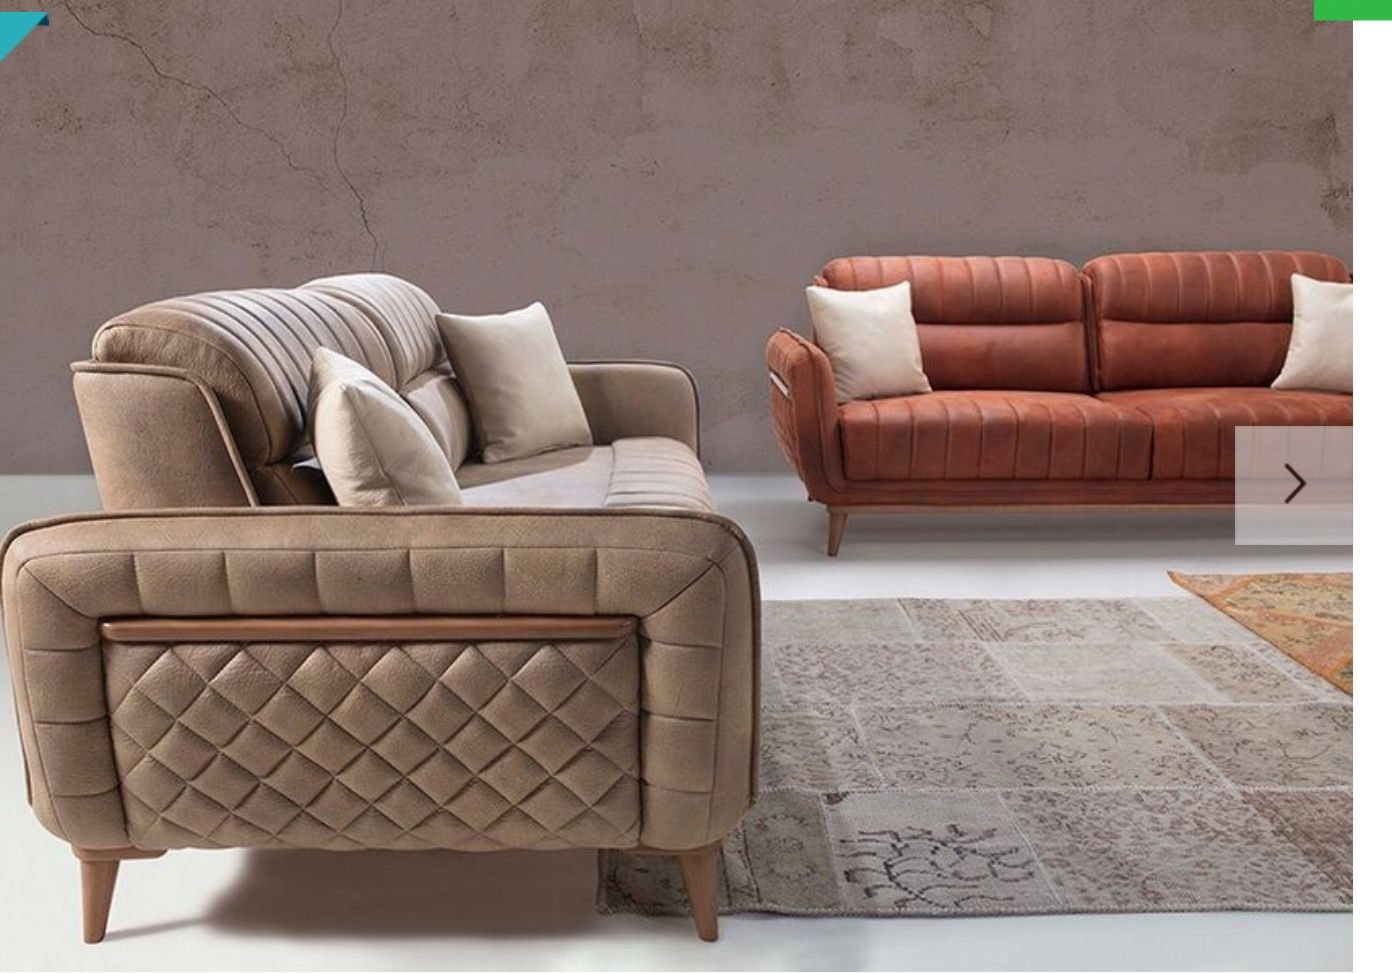 Pin By Moi Lotchi On Mobilier De Salon Sofa Design Sofa Set Living Room Sofa Design